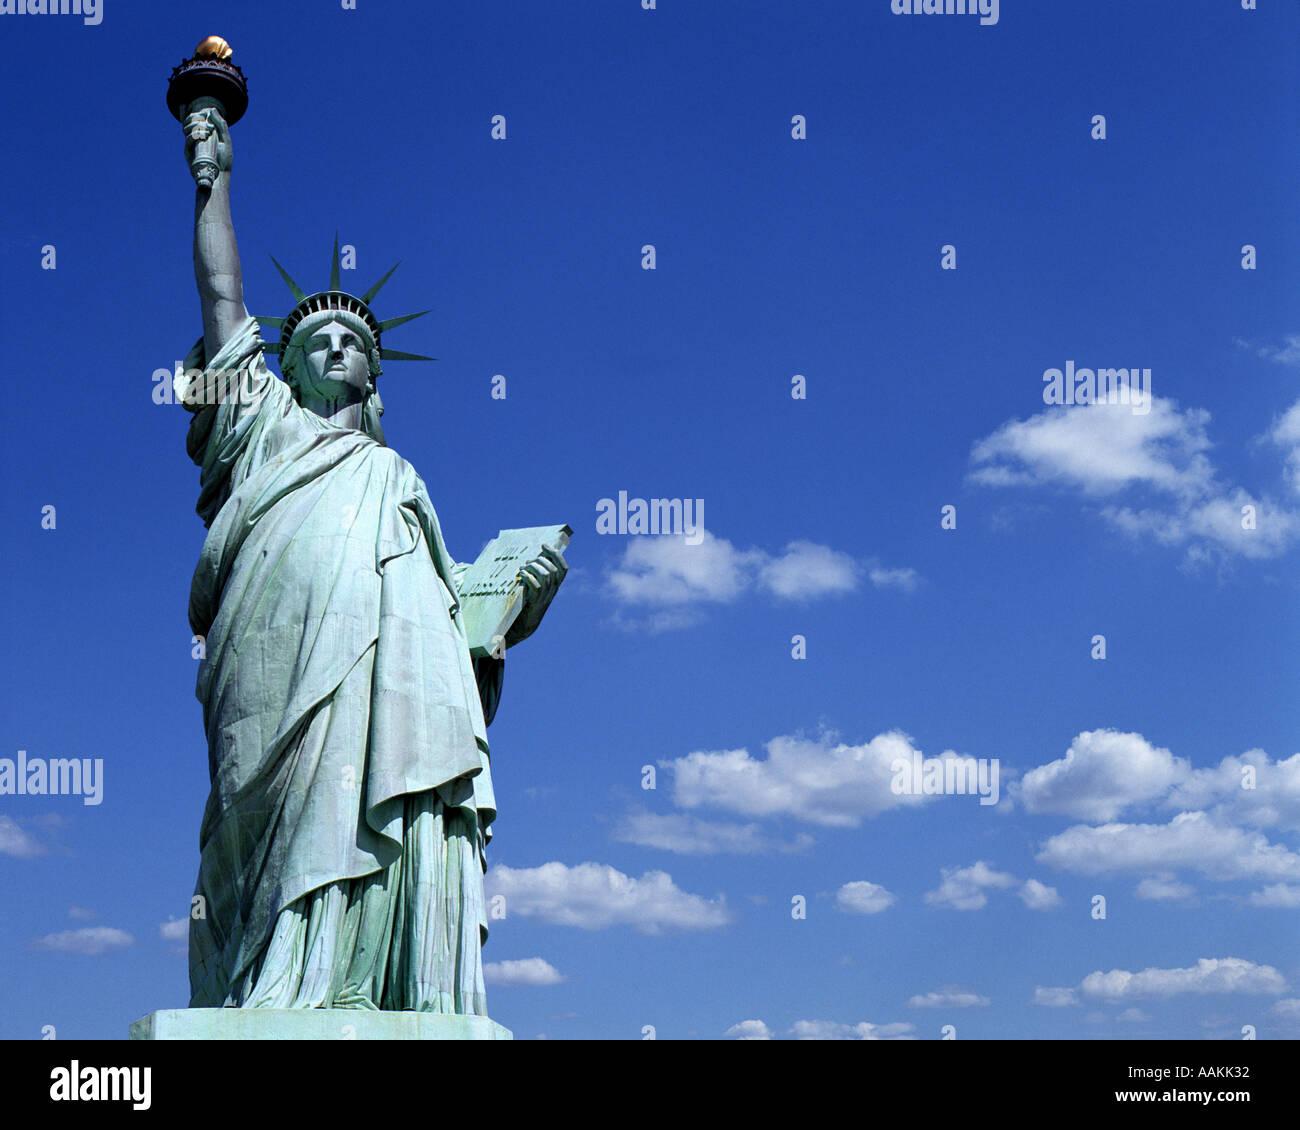 USA - NEW YORK: Statue de la Liberté Photo Stock